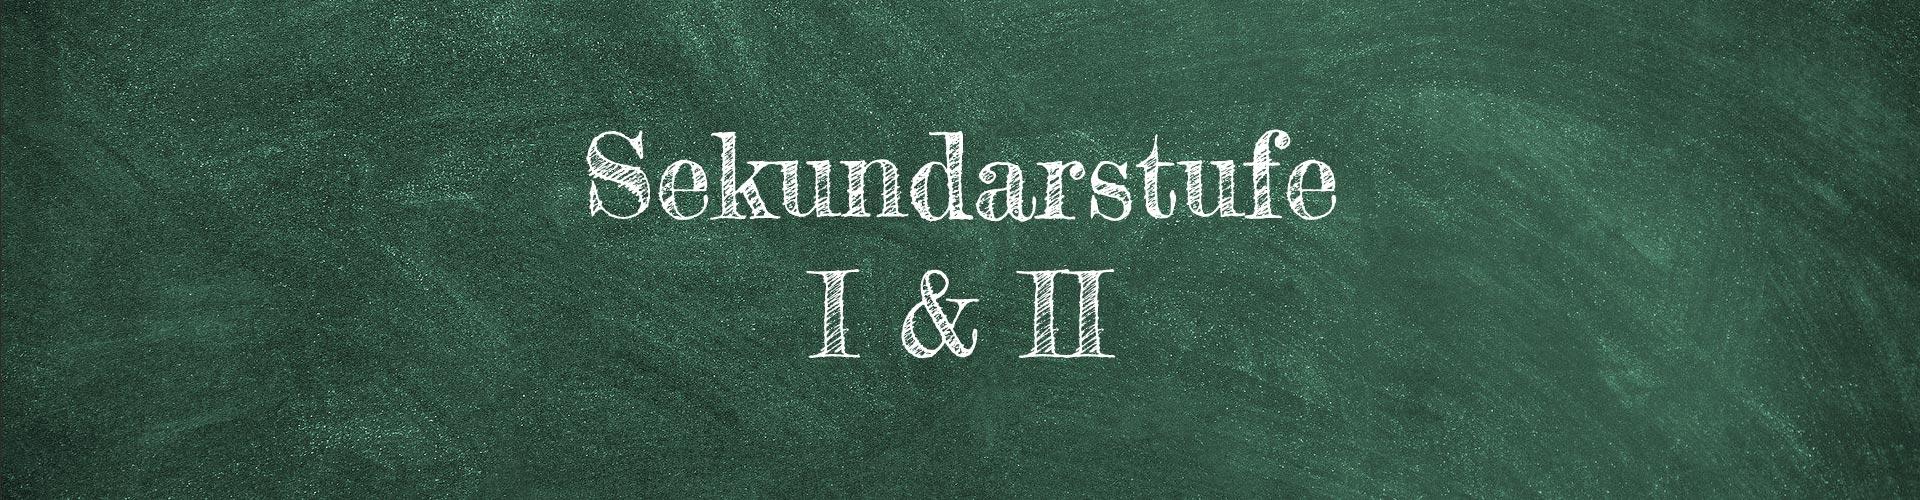 IKG Wilthen Gymnasium Sekundarstufe